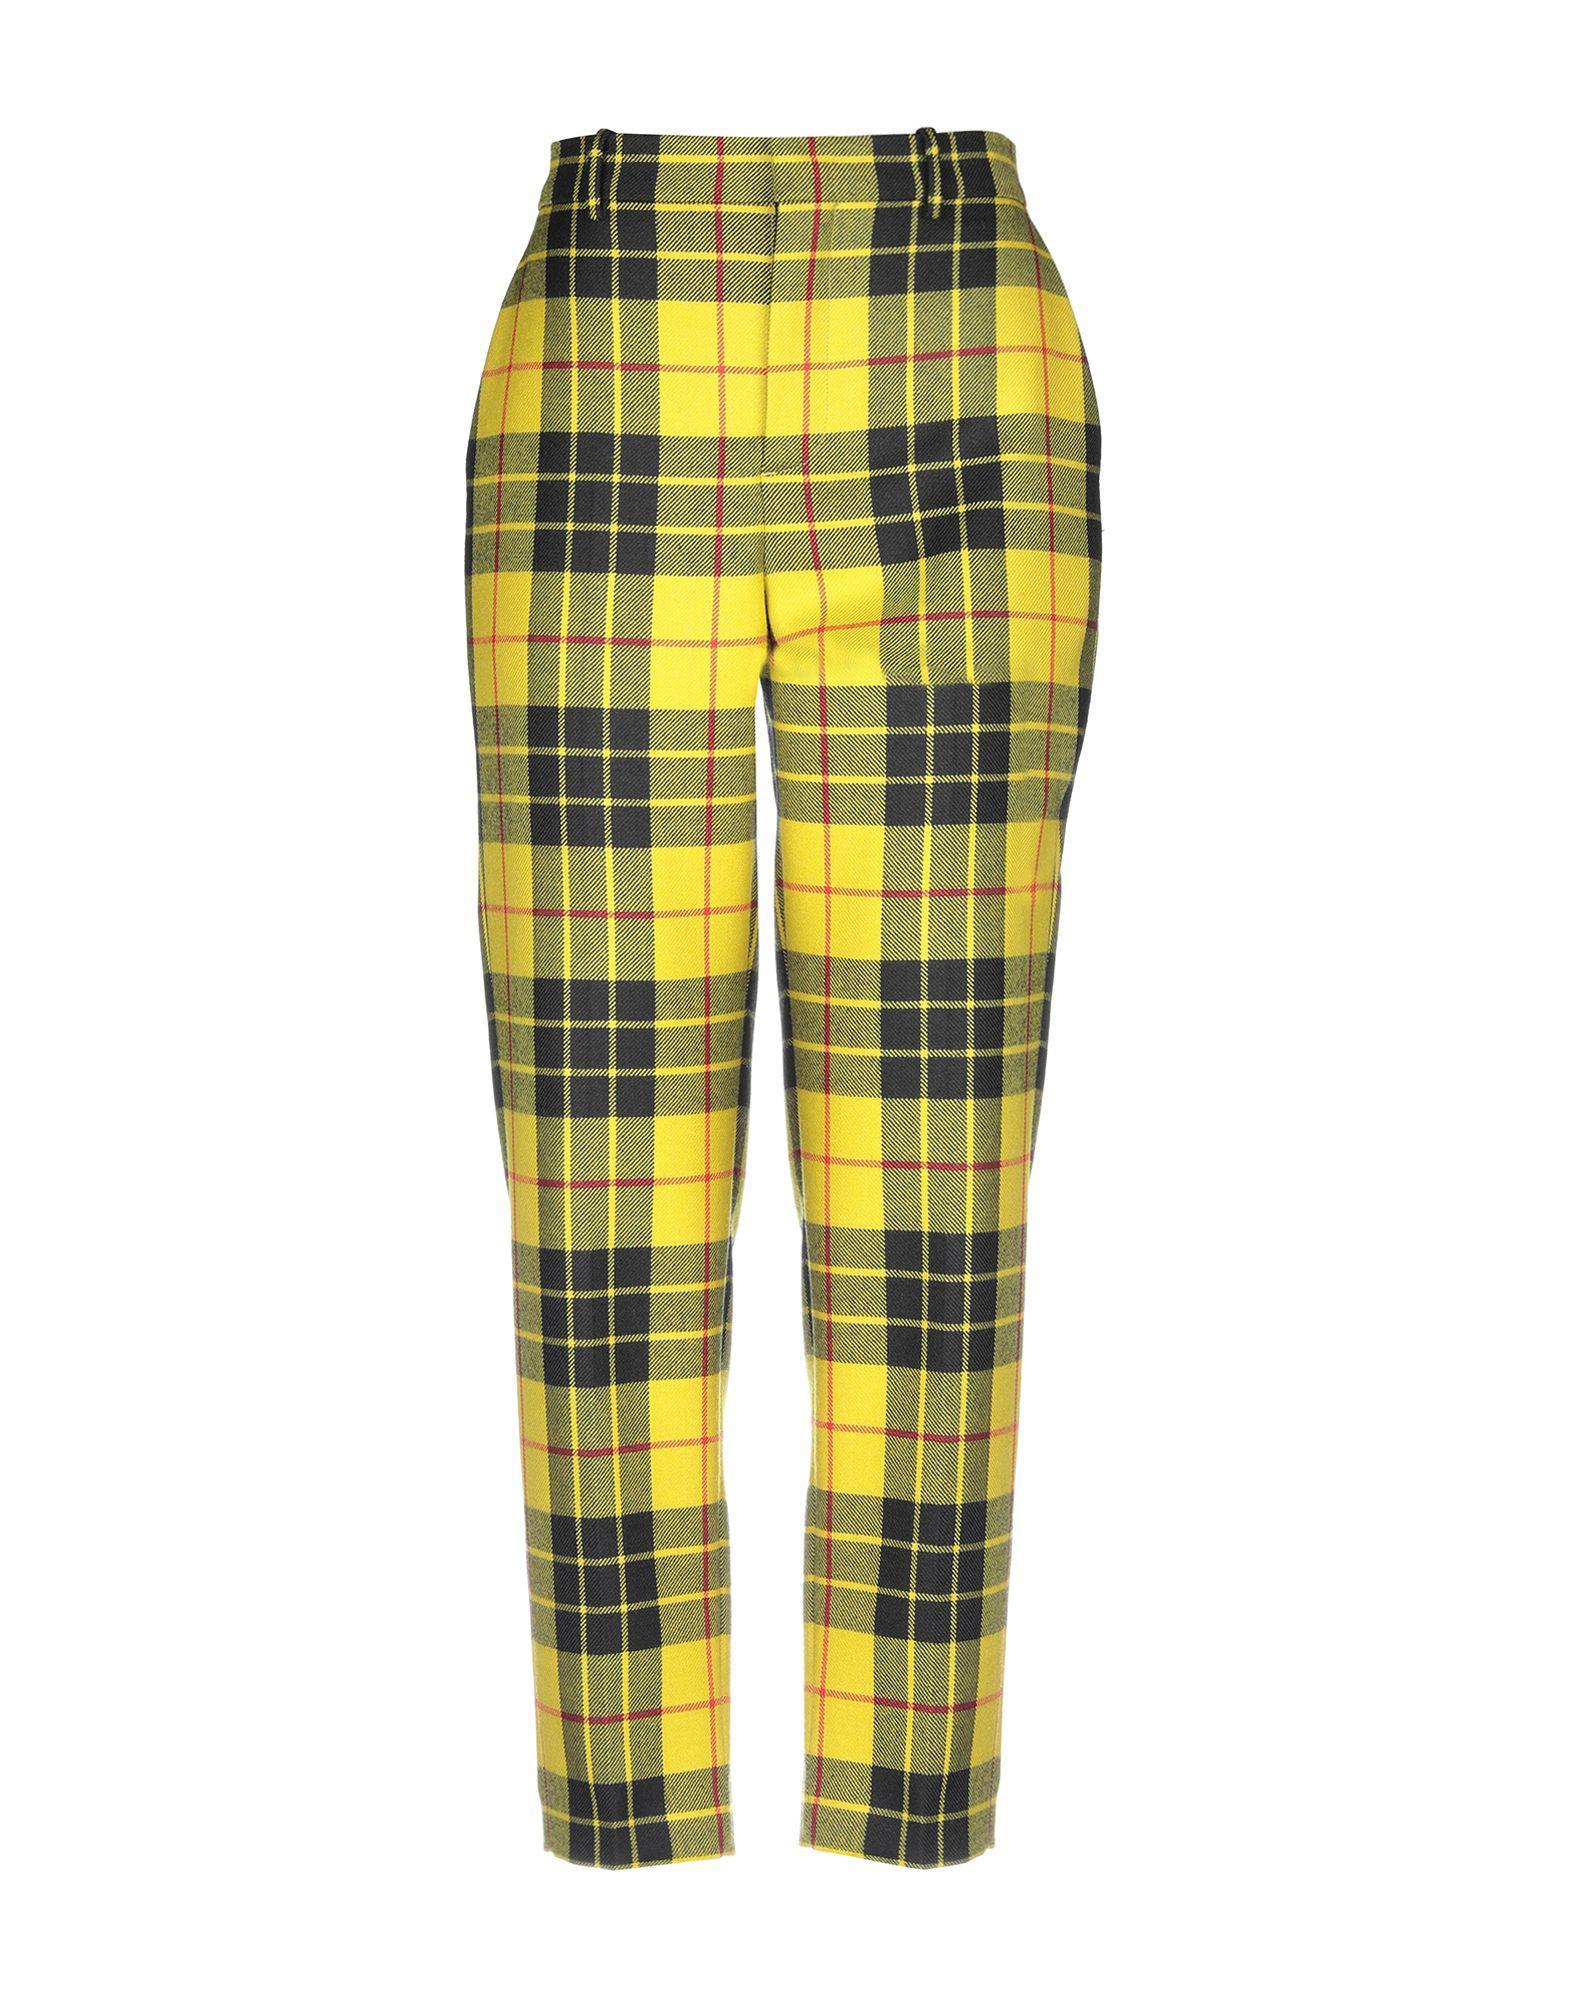 5f11145cb49f Lyst - Balenciaga Casual Trouser in Yellow - Save 43%